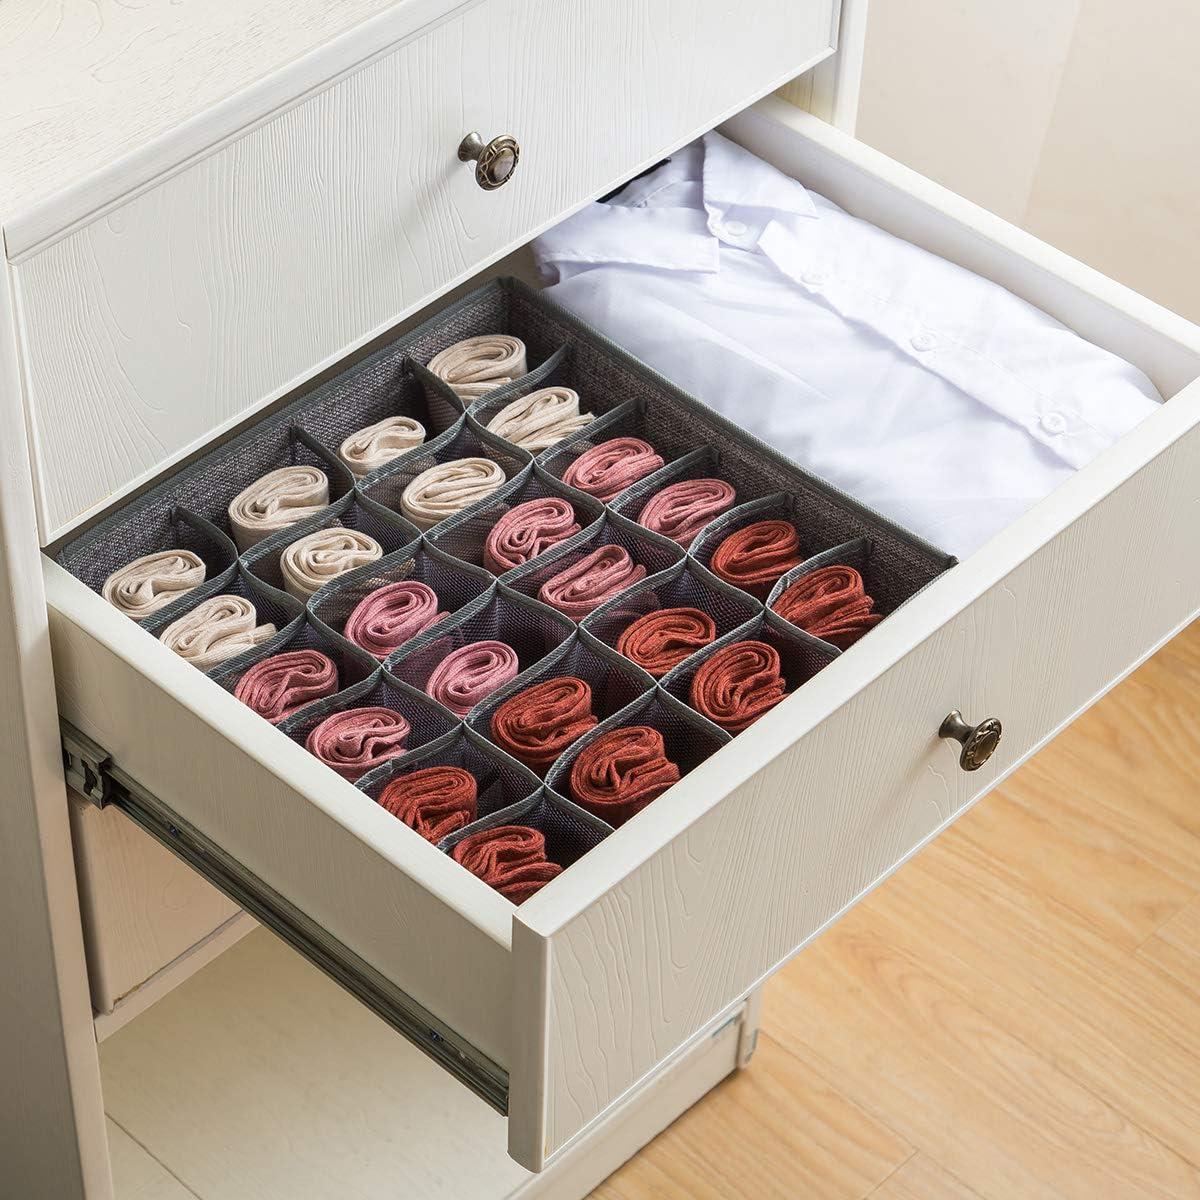 24 Cell Collapsible Closet Cabinet Organizer Underwear Storage Boxes for Storing Socks Qozary 2 Pack Linen Textured Closet Socks Organizer Drawer Divider Gray, 242 Underwear Lingerie